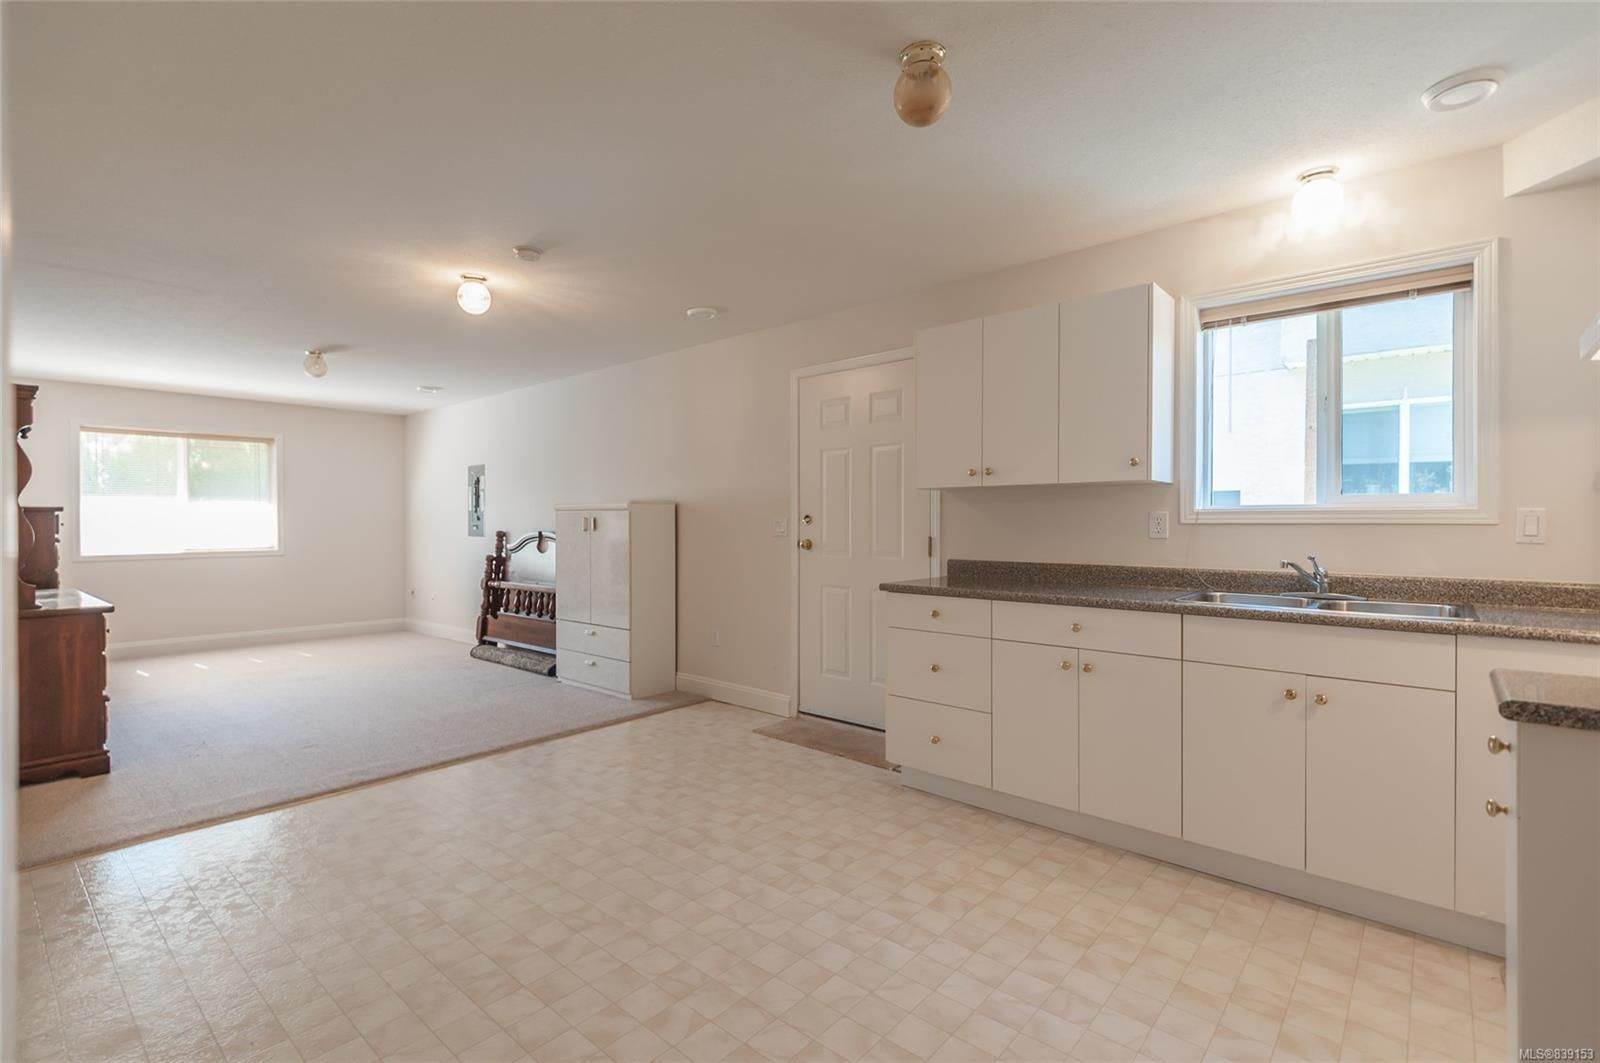 Photo 44: Photos: 6412 Dover Rd in NANAIMO: Na North Nanaimo House for sale (Nanaimo)  : MLS®# 839153